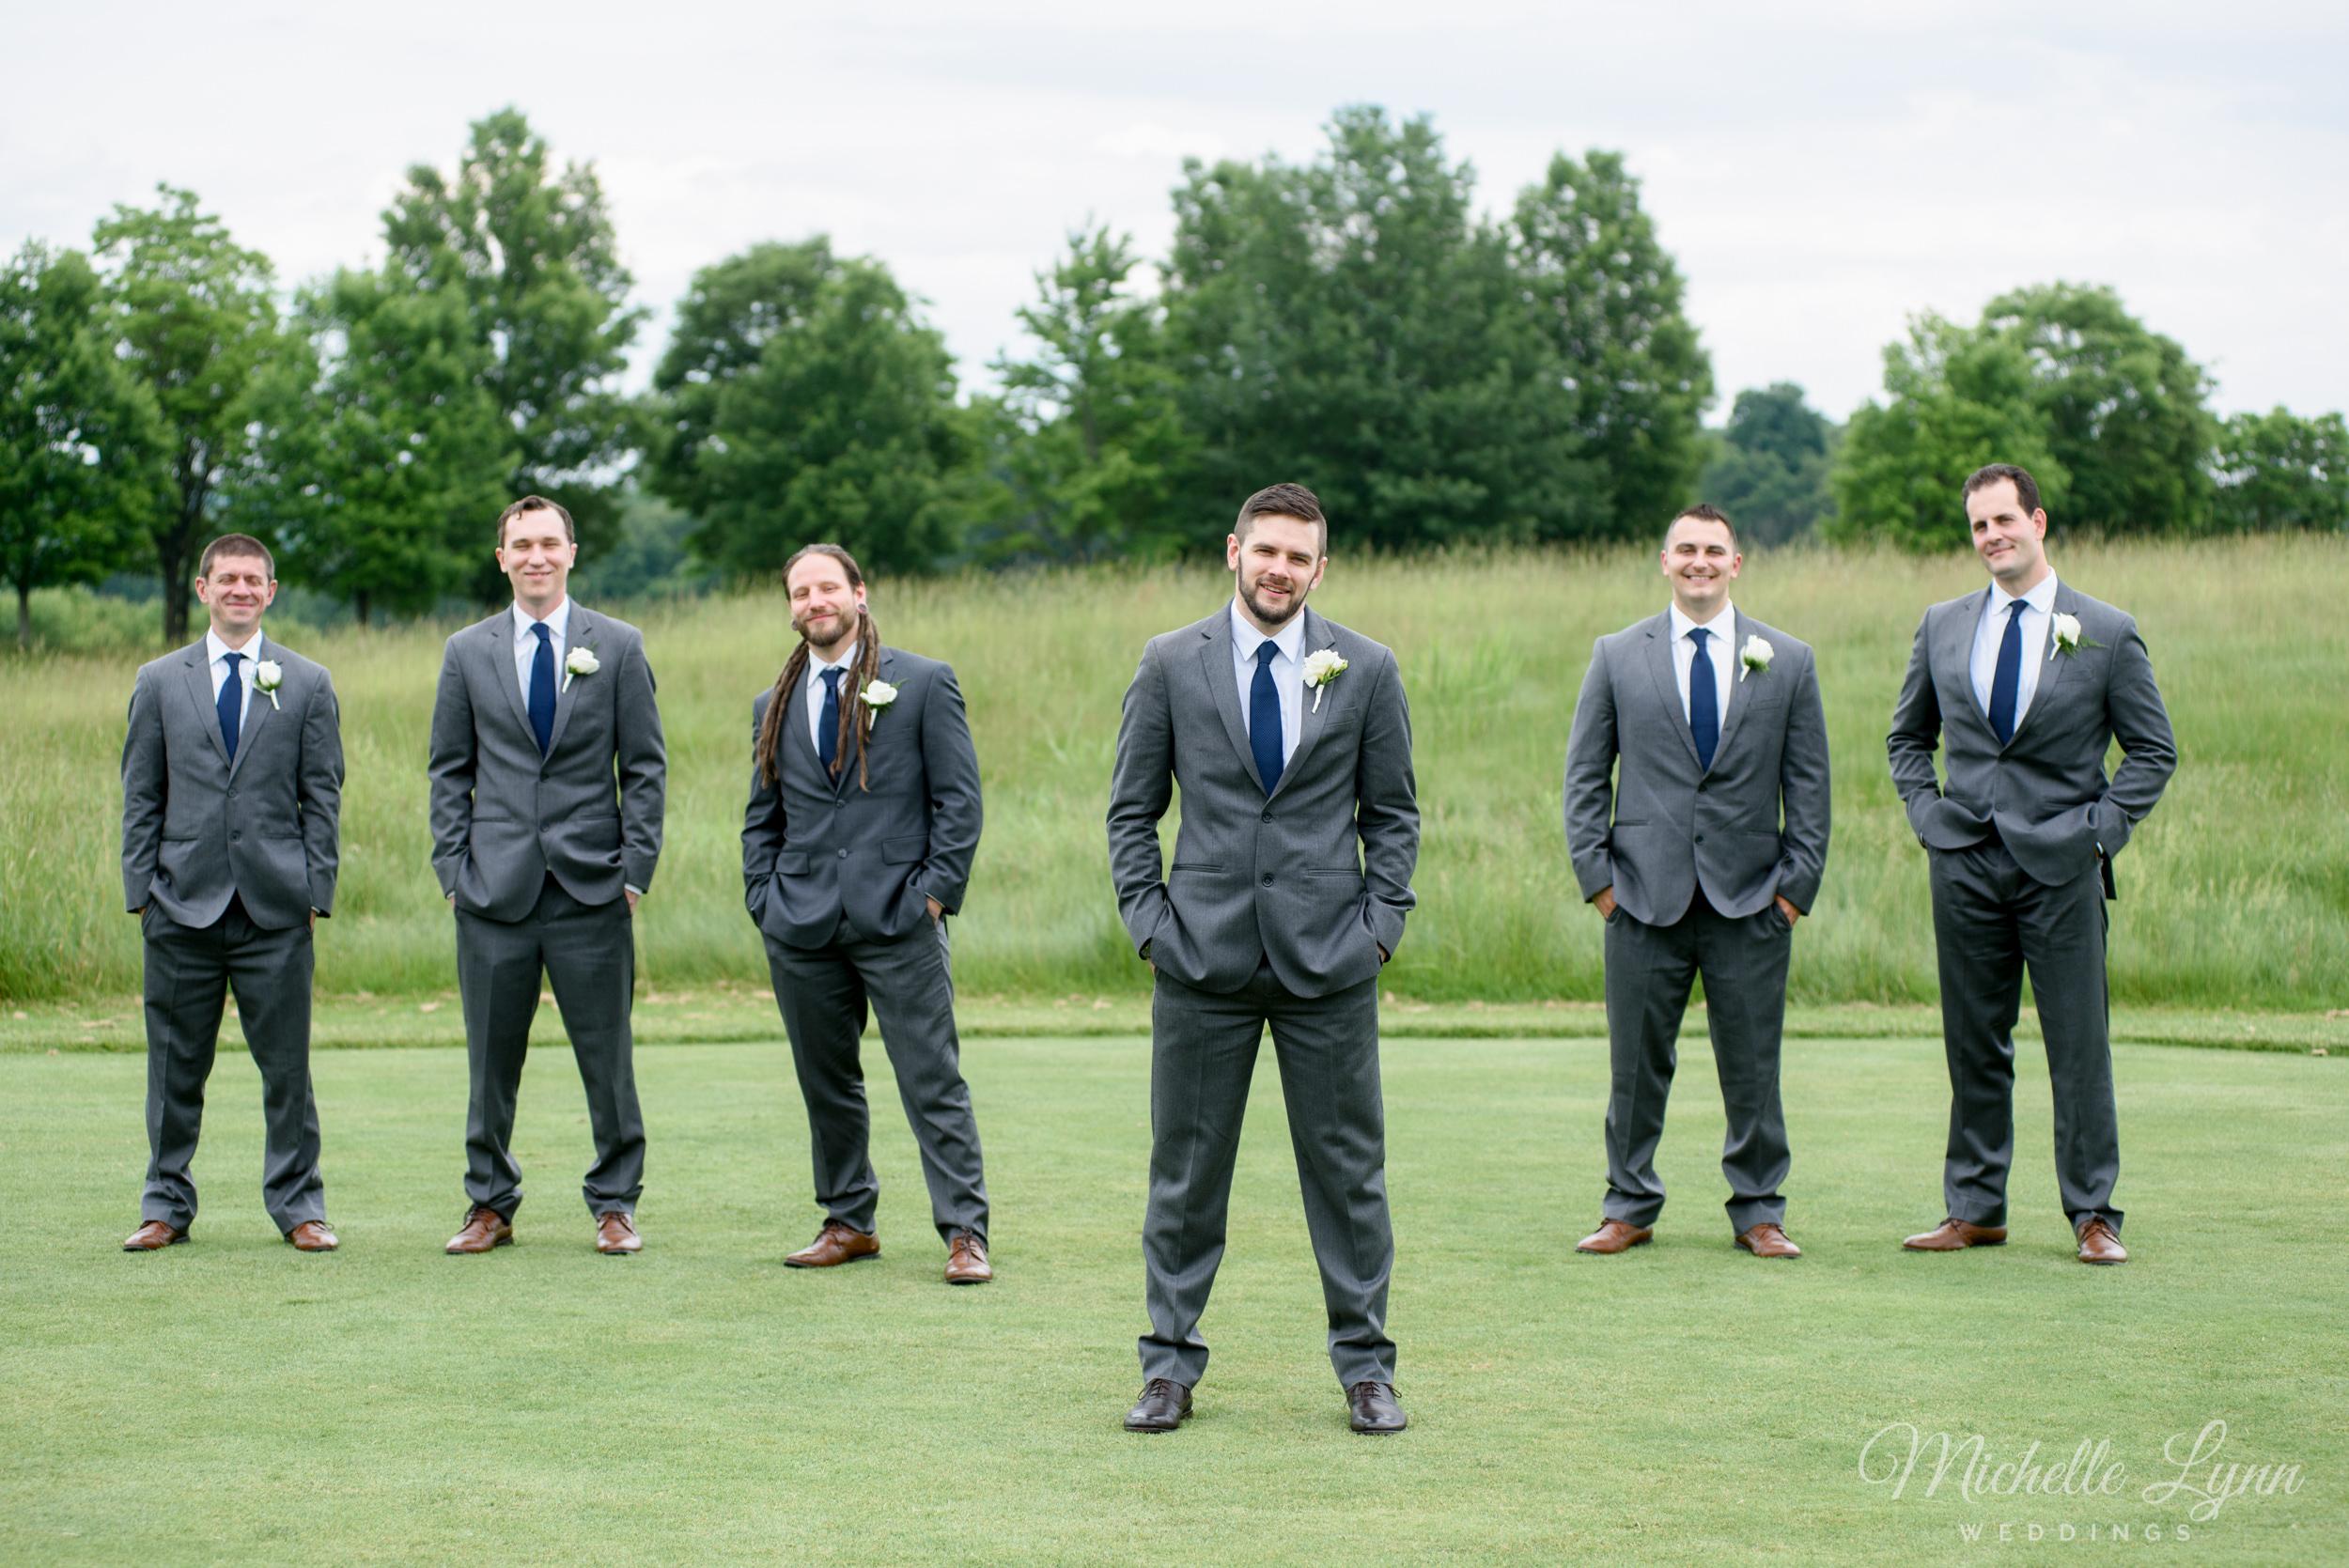 mlw-jericho-national-golf-club-wedding-photography-48.jpg